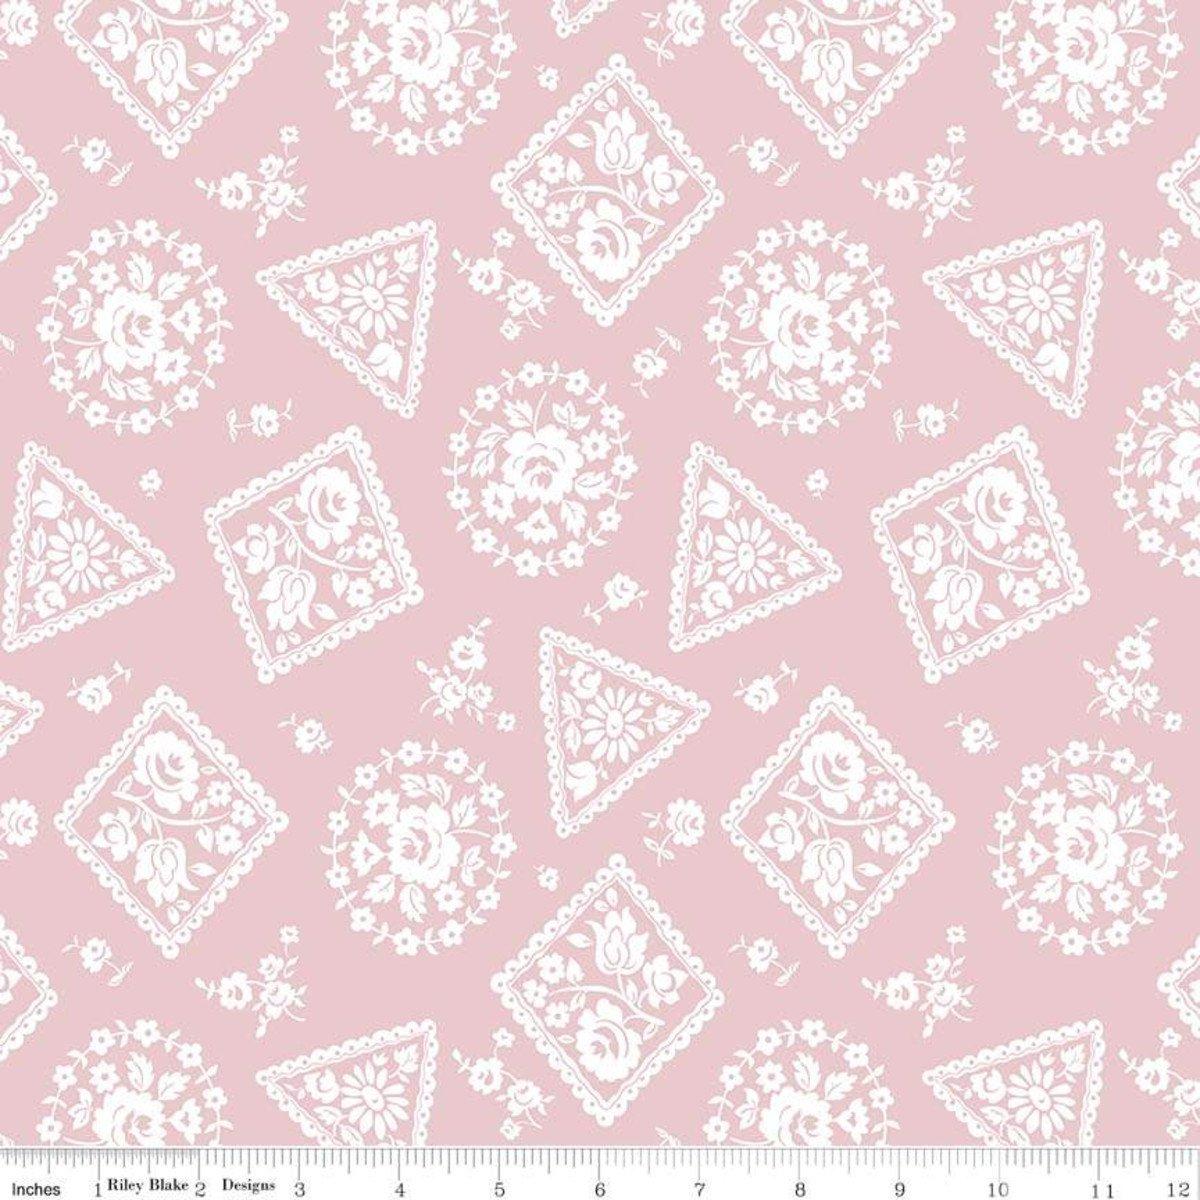 Majestic Stamp Pink- c8143